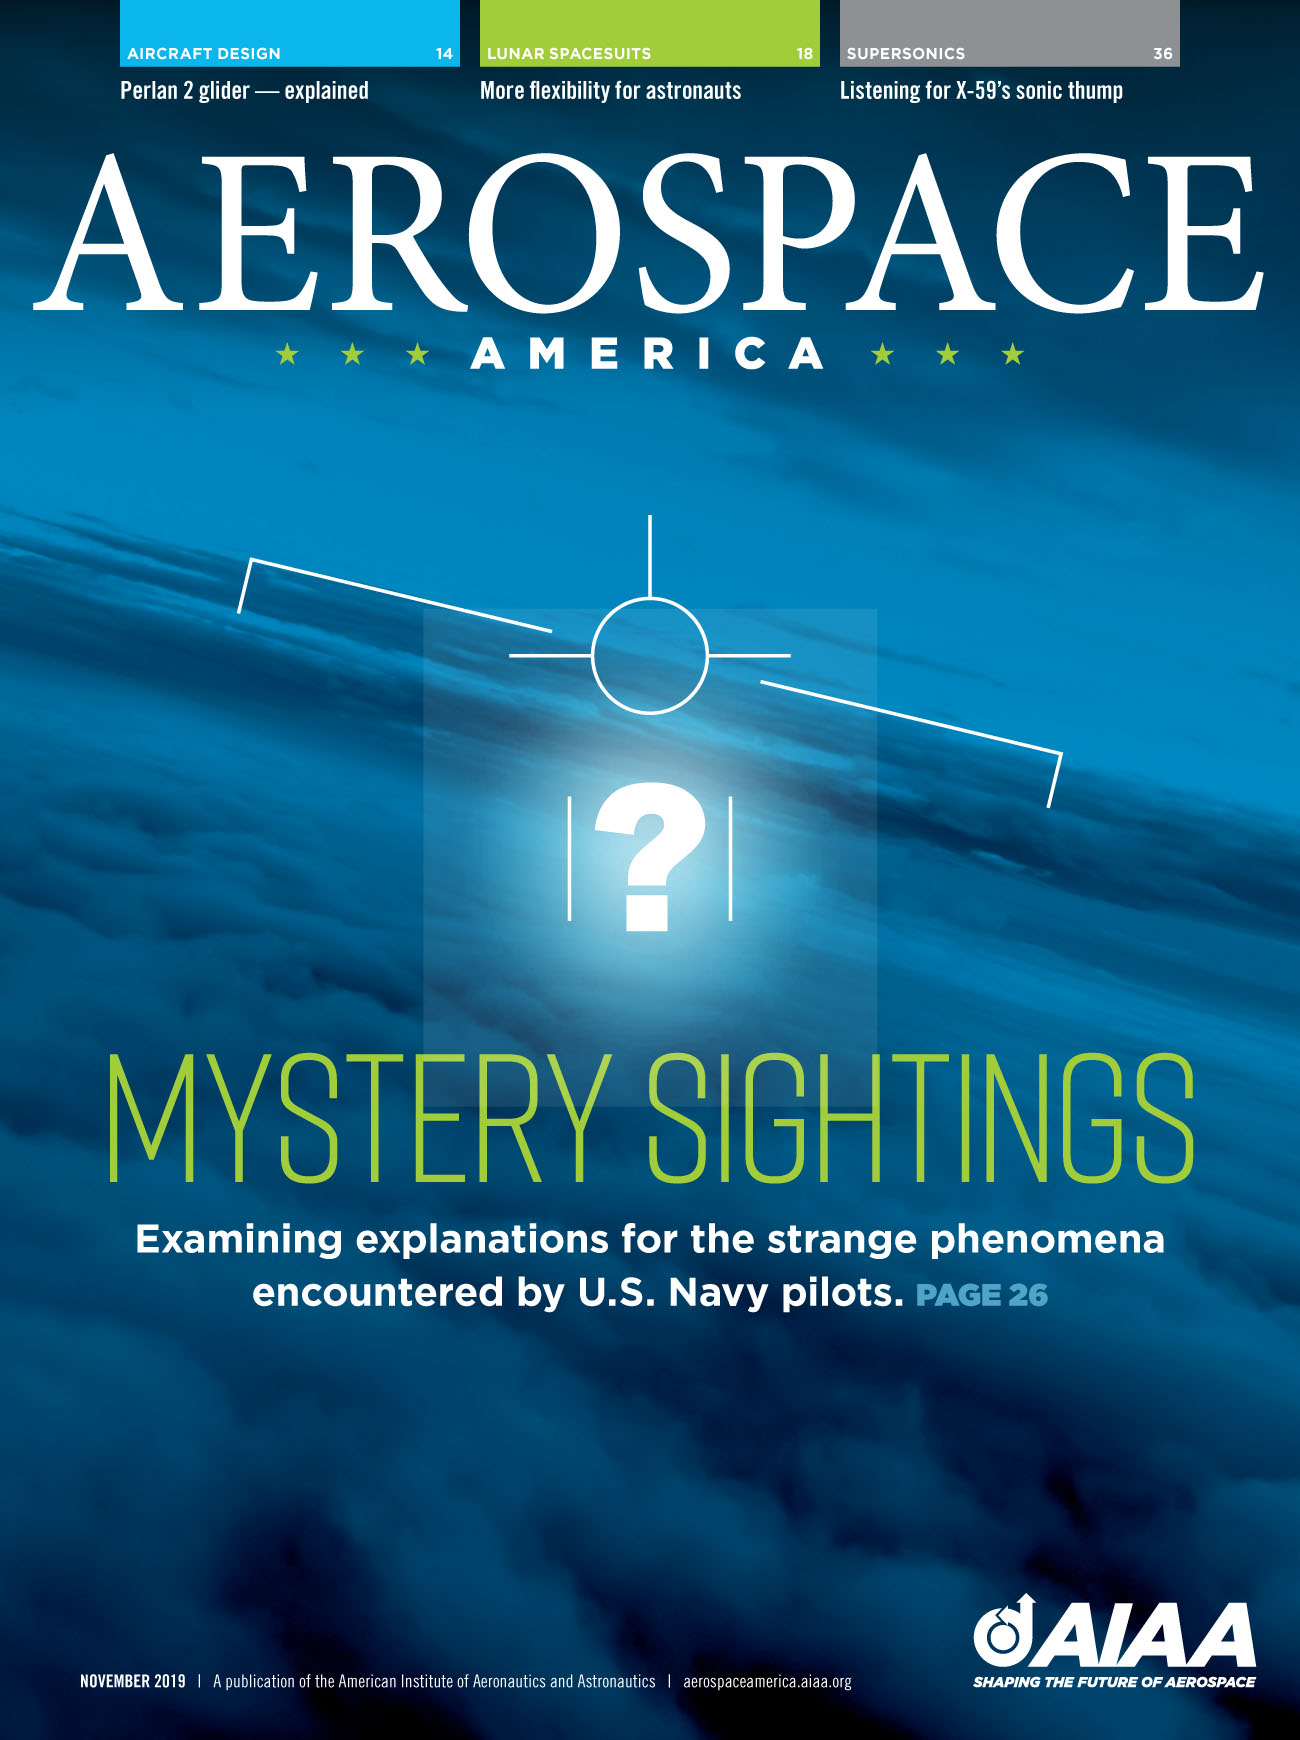 Aerospace America 2019-11 UFO 01.jpg